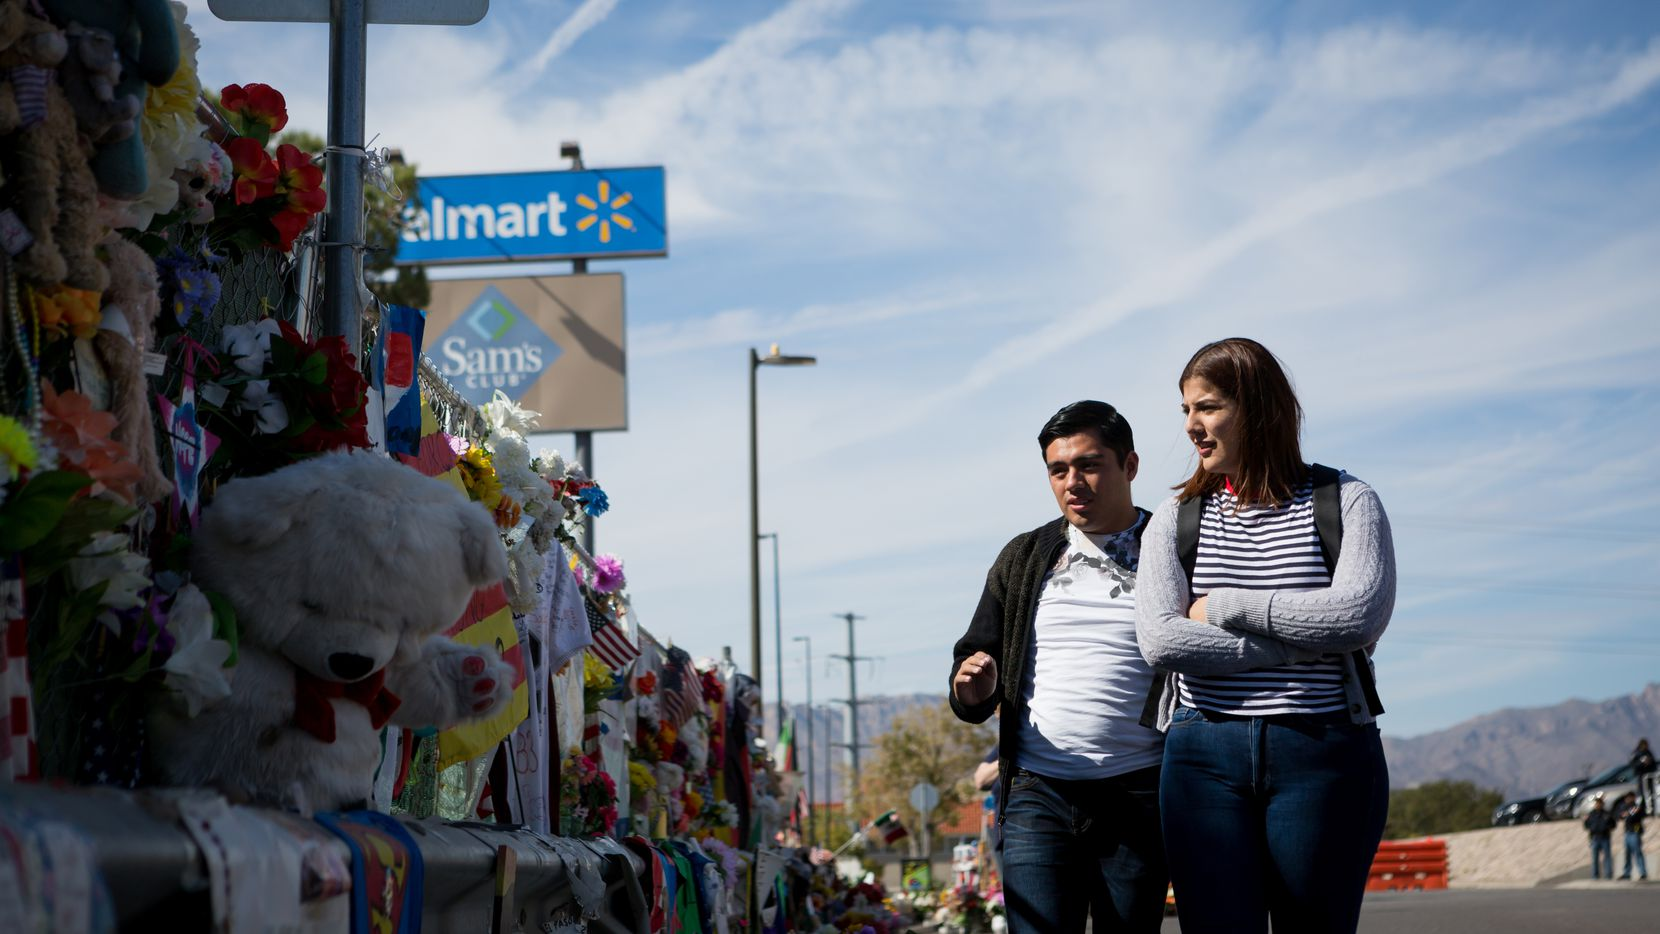 Gaddiel Antonio and Diana Castaneda, from Juarez, Mexico, visit the memorial that honors victims of the Walmart mass shooting for Dia de los Muertos in El Paso on Saturday, Nov. 2, 2019.